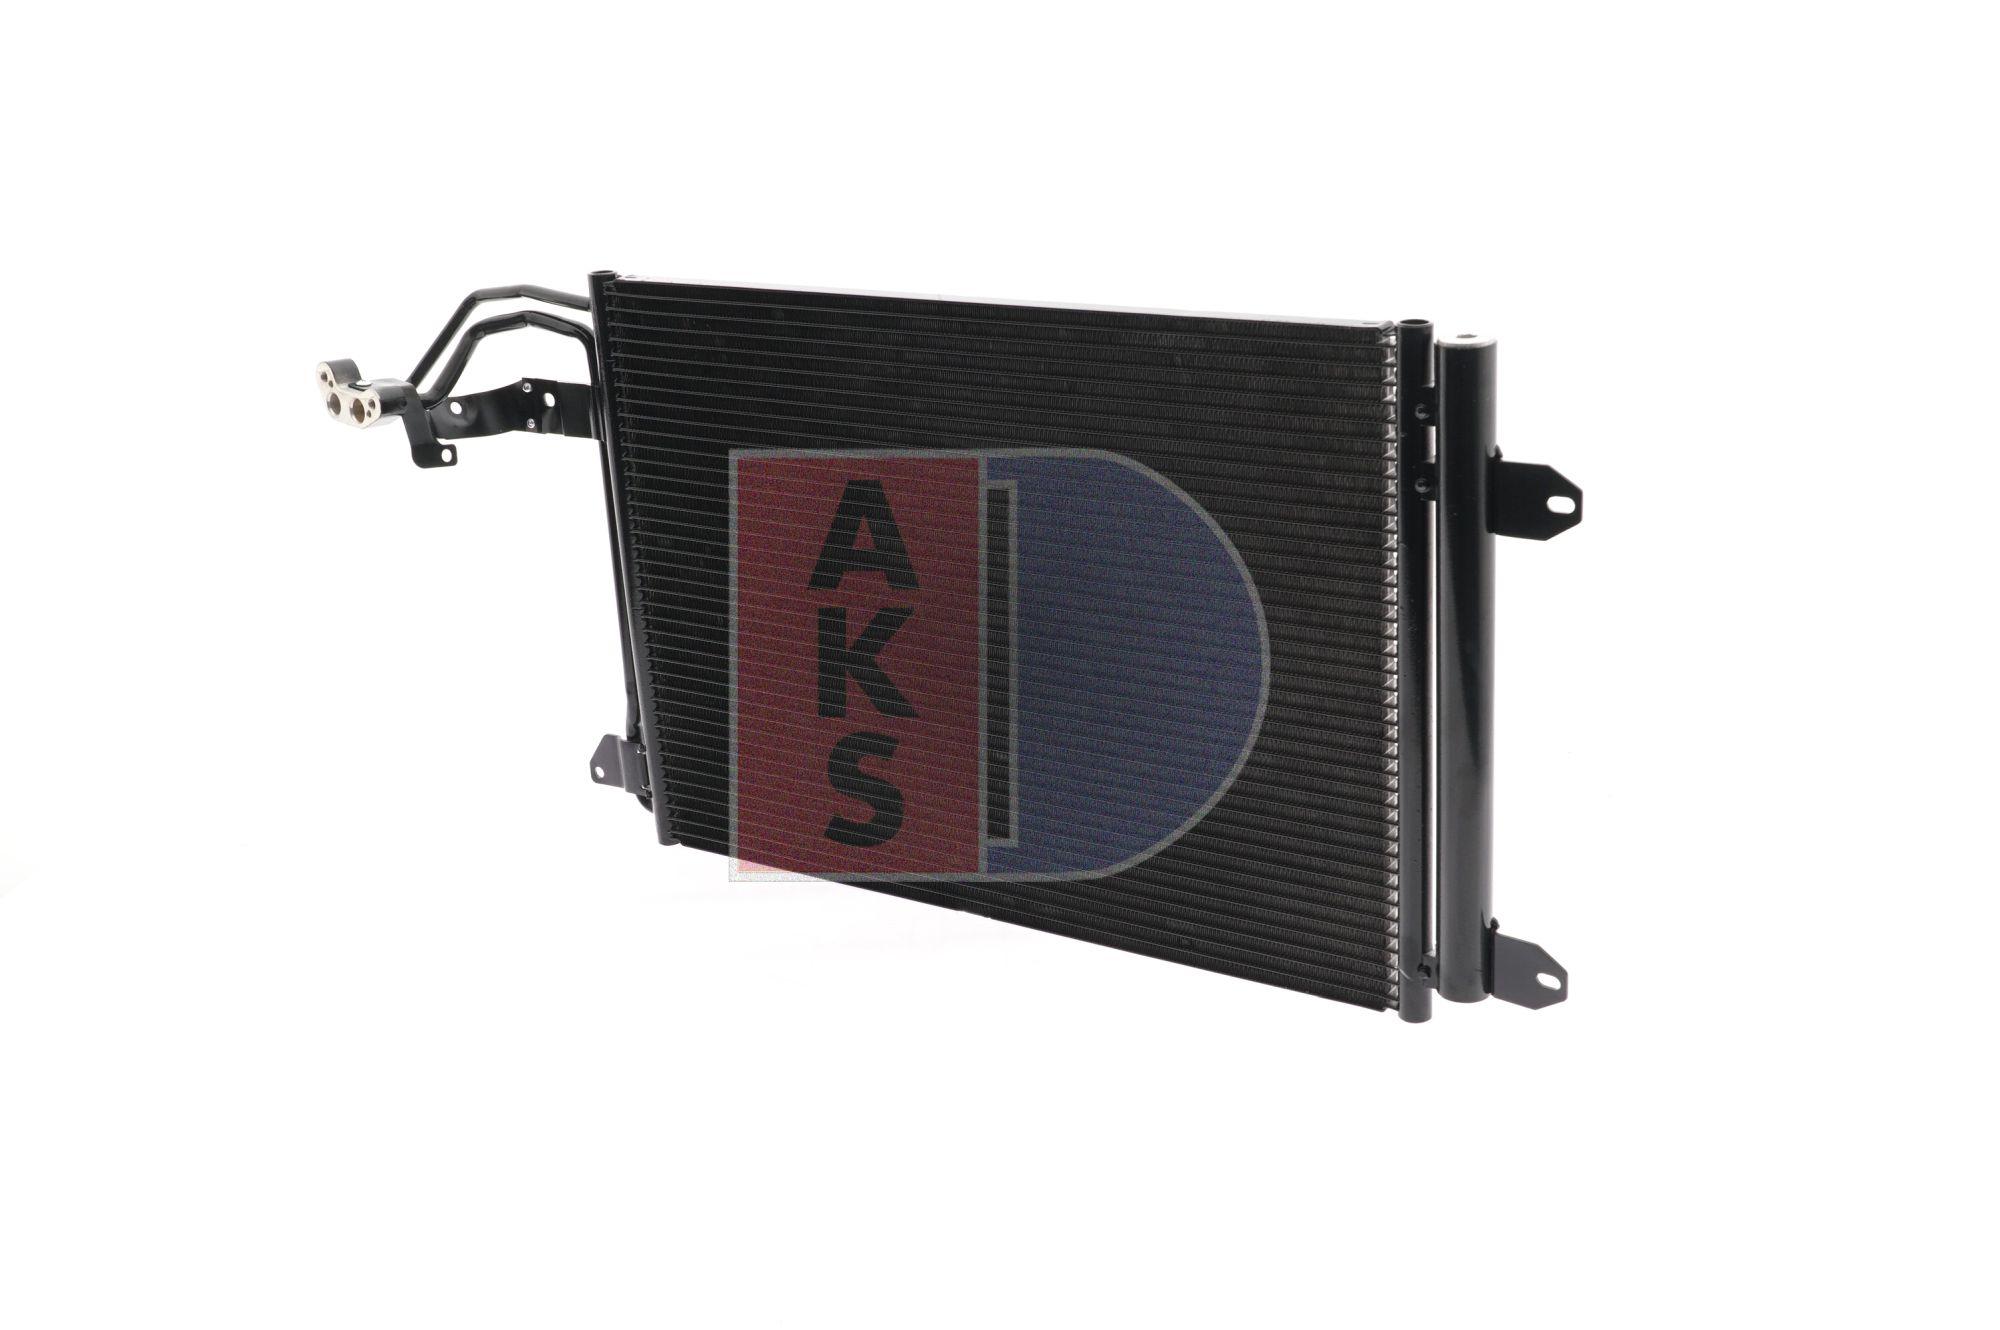 AKS DASIS: Original Klimakühler 042008N (Netzmaße: 535x388x16)